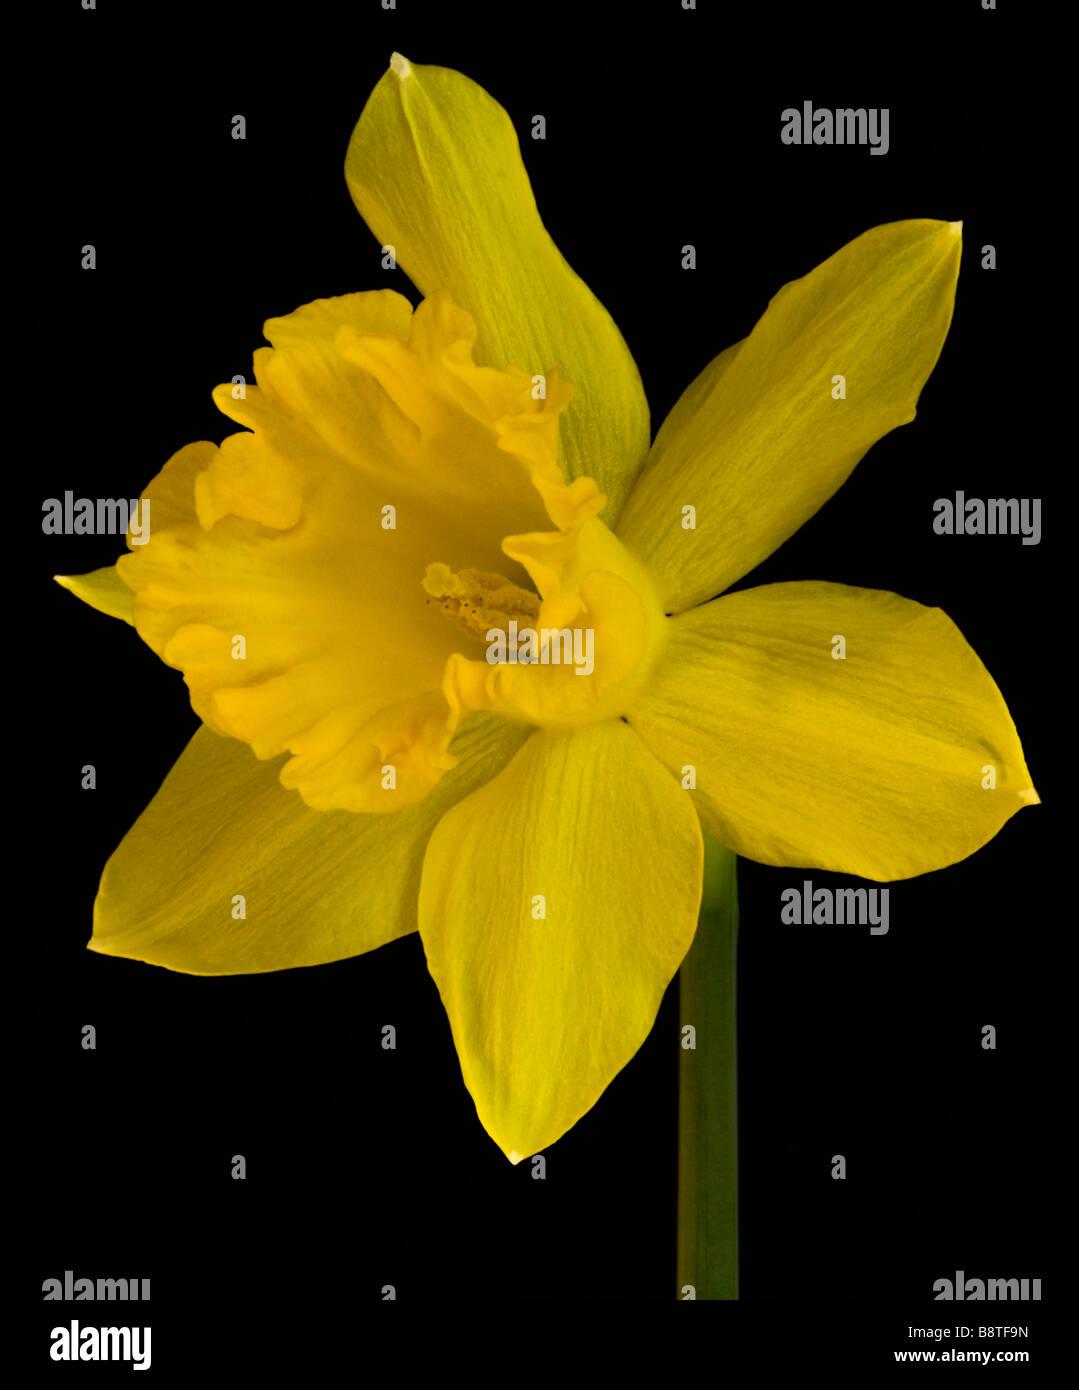 Yellow Daffodil Blossom - Stock Image